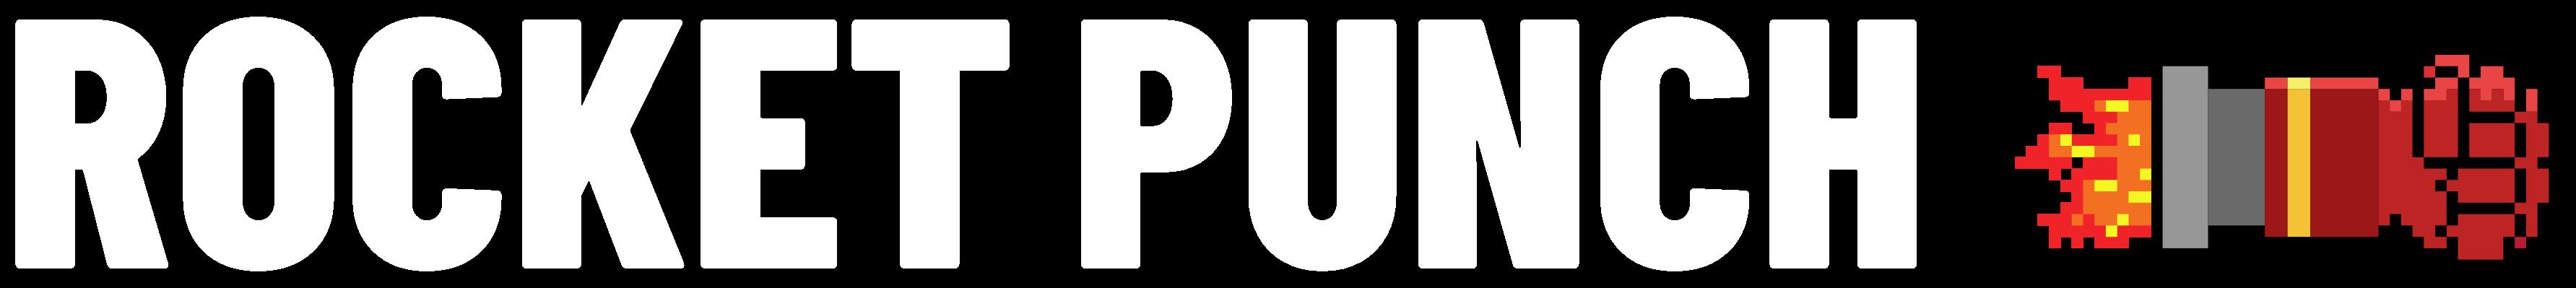 Rocket Punch Site Logo